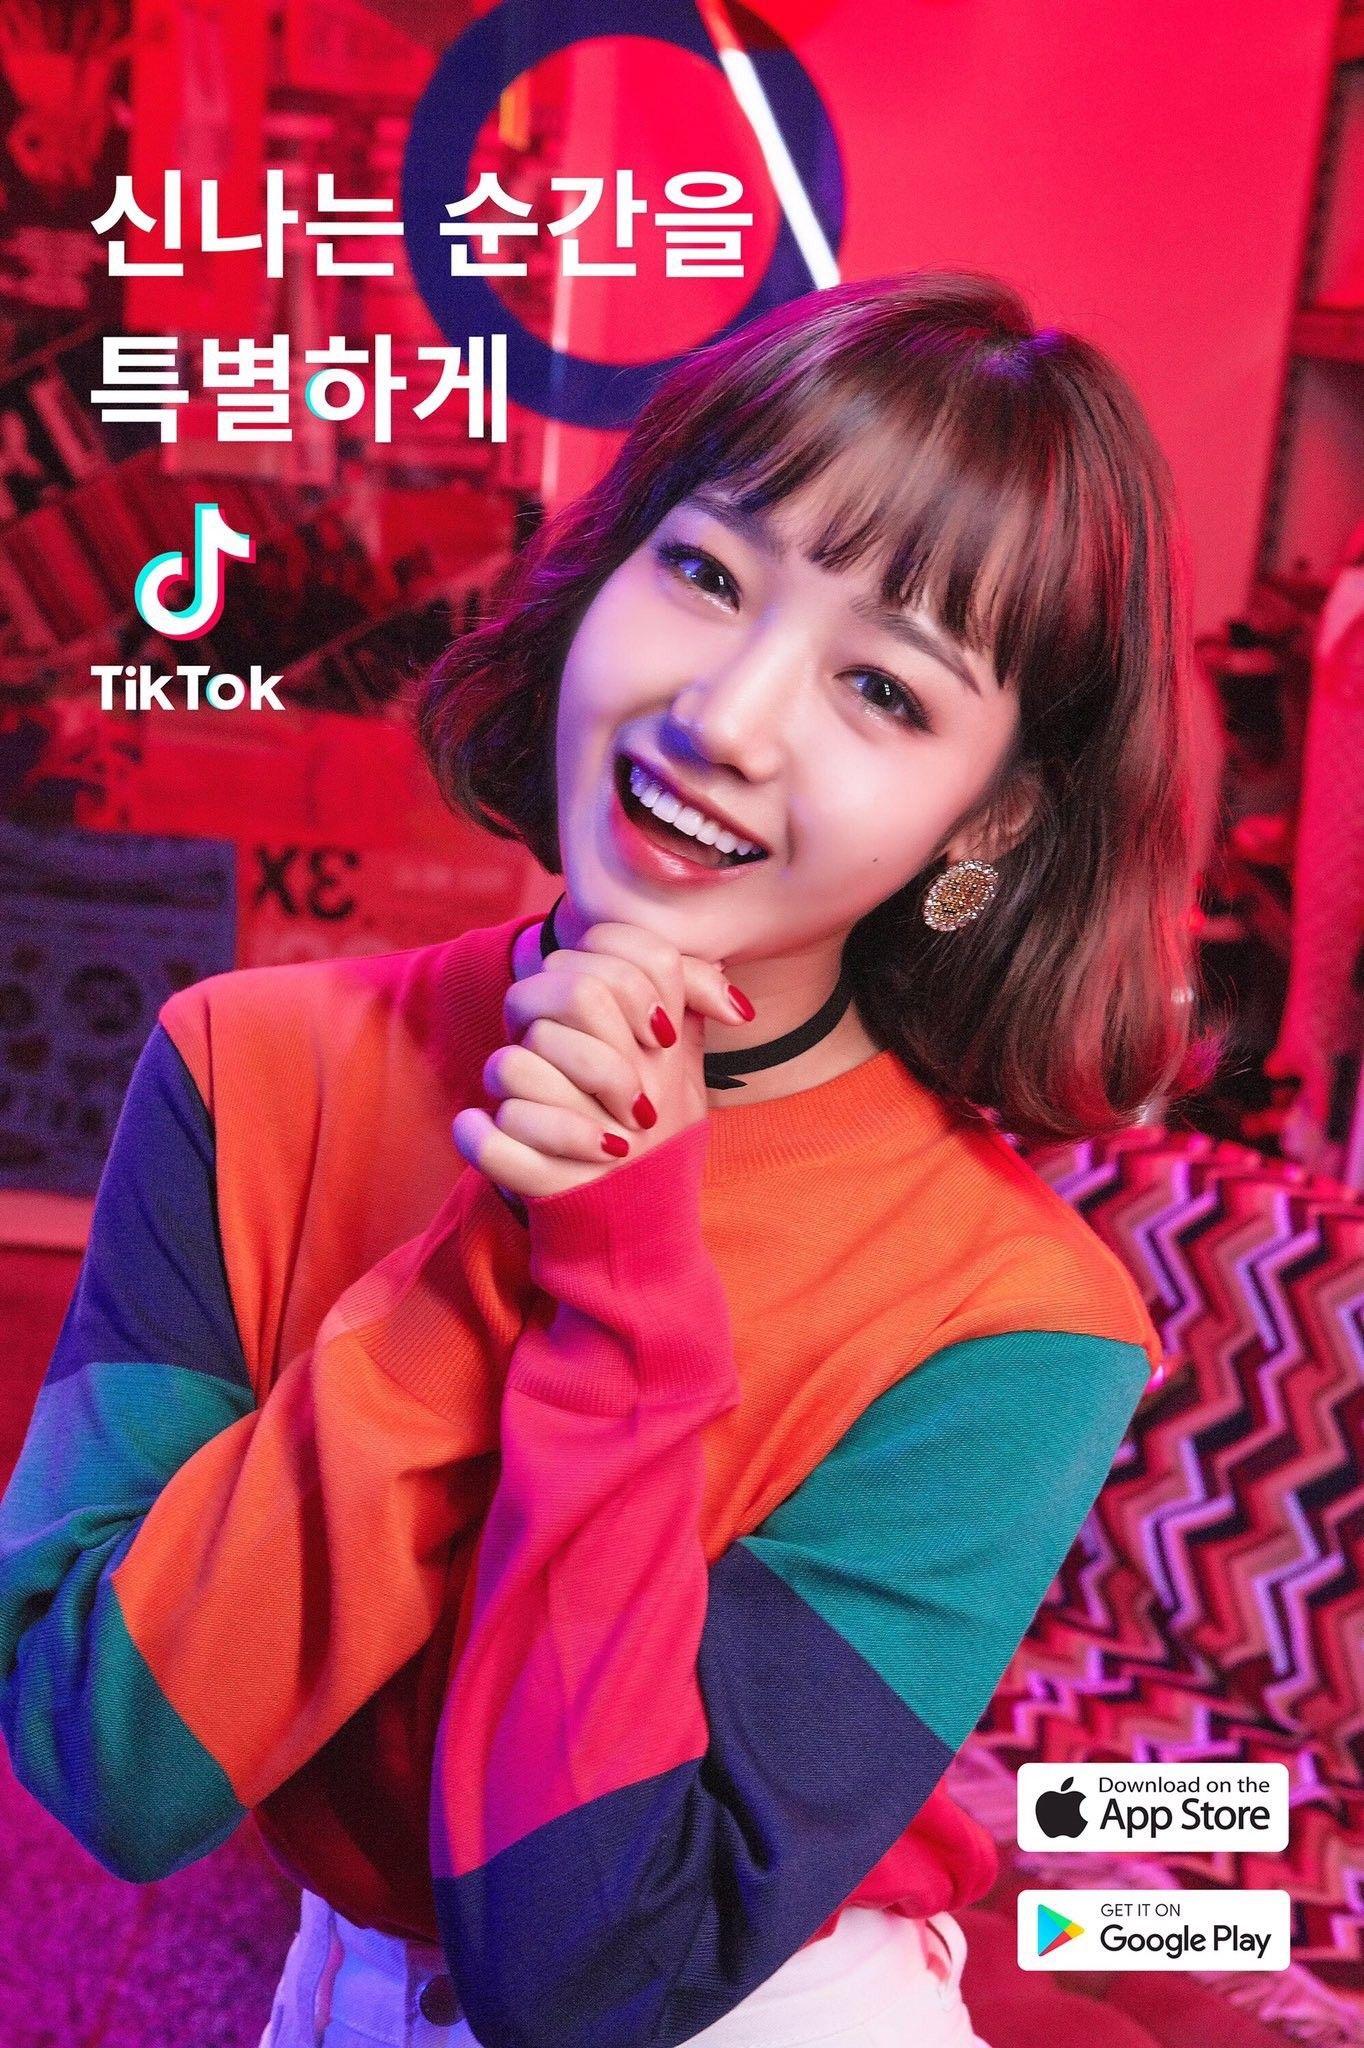 Yoojung For Tik Tok Choi Yoojung Ioi Pop Dance